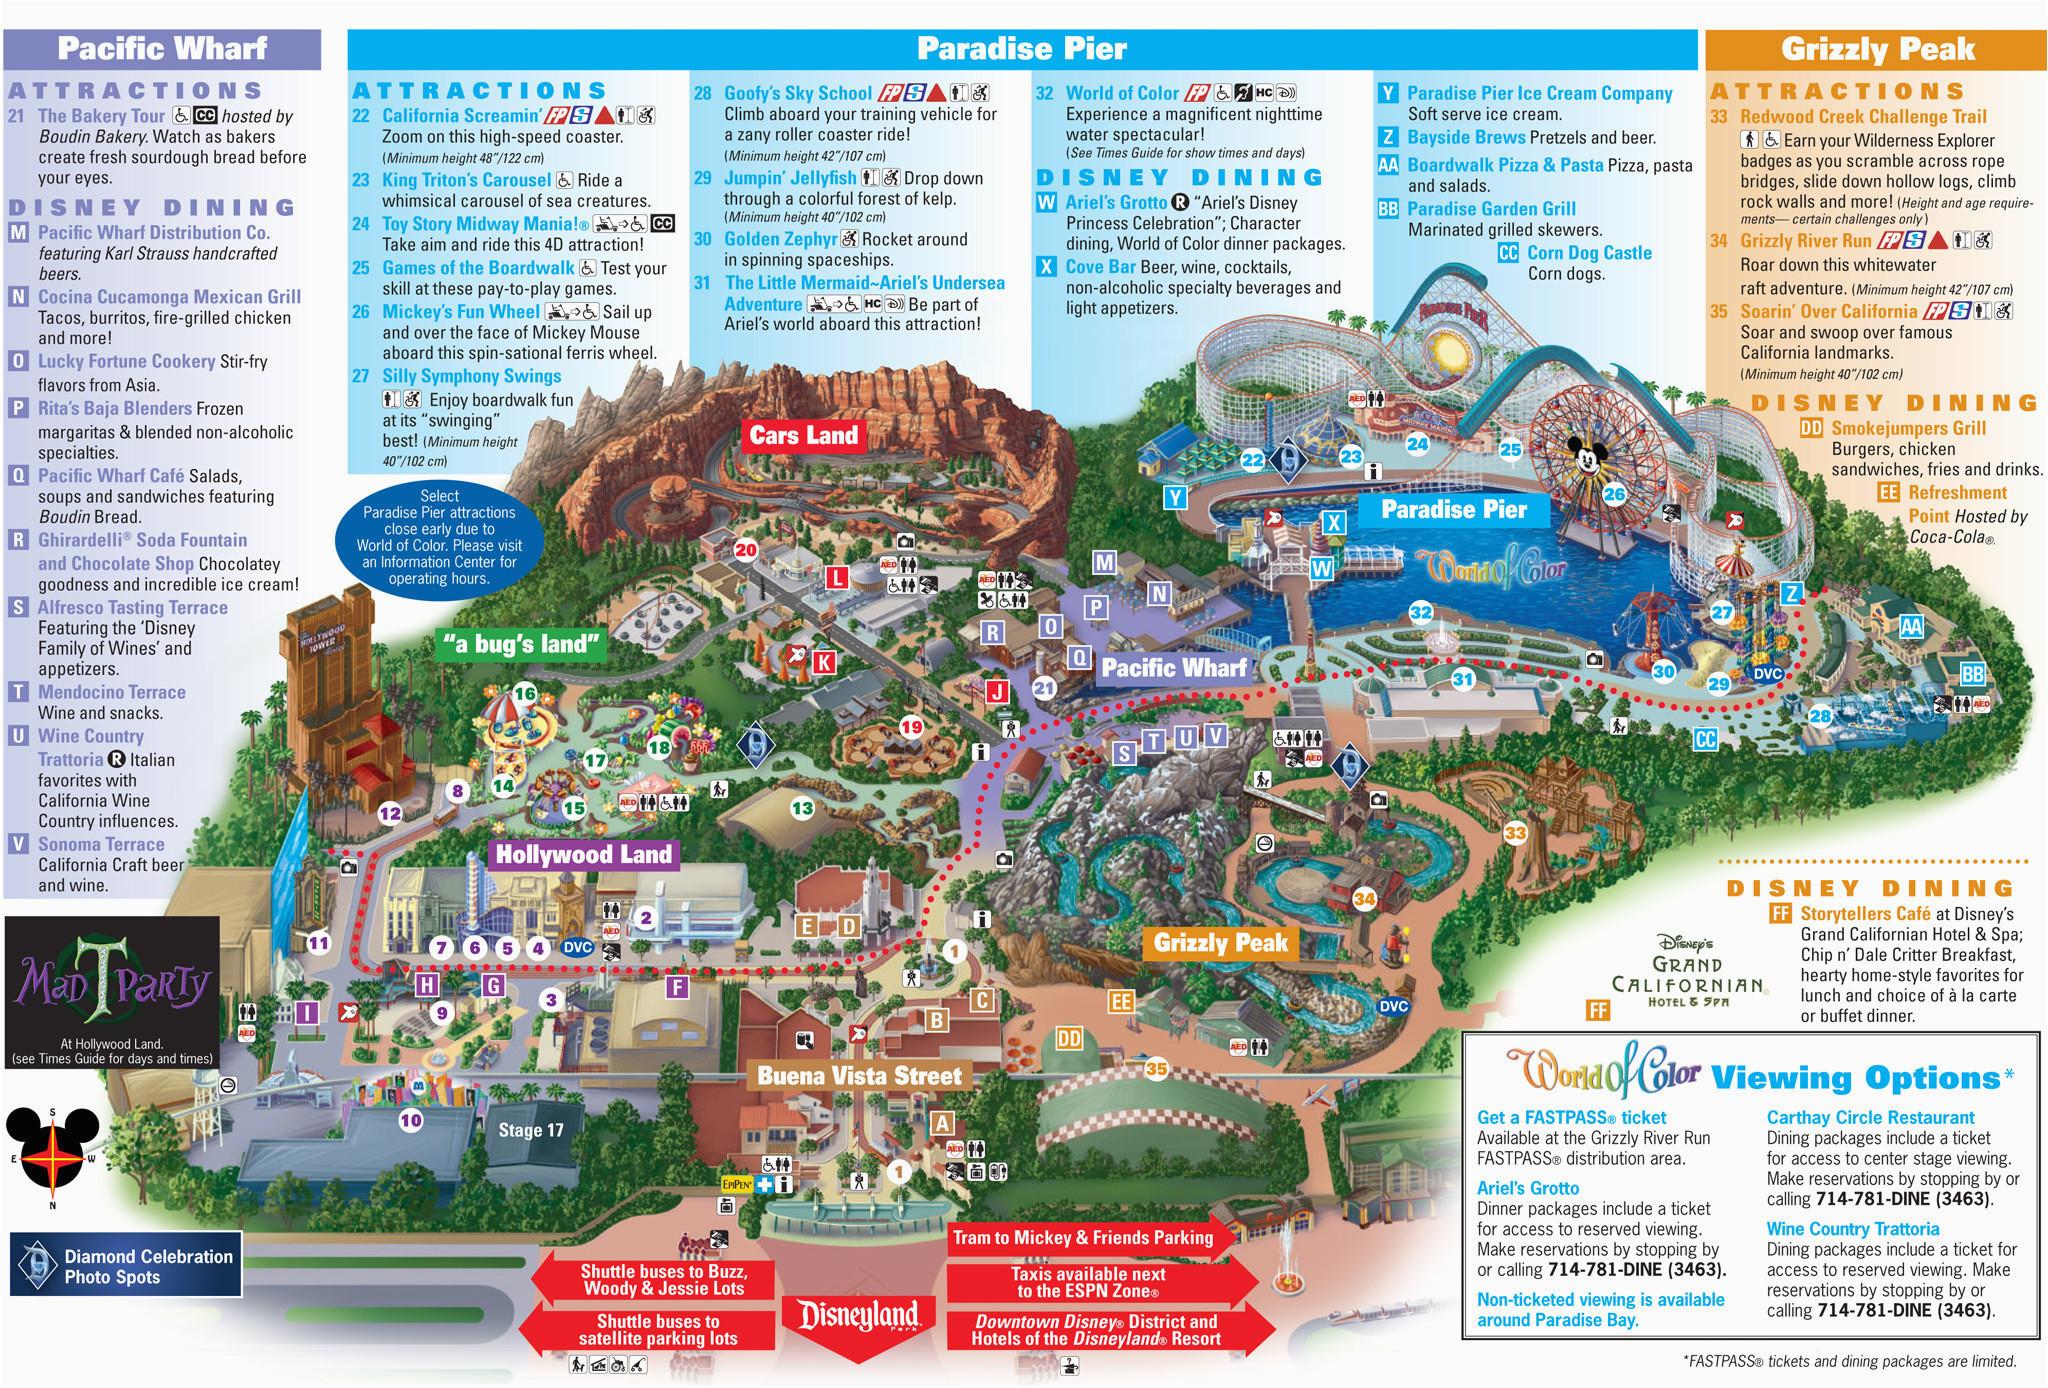 Printable California Adventure Map Printable Map Disneyland and California Adventure Ettcarworld High